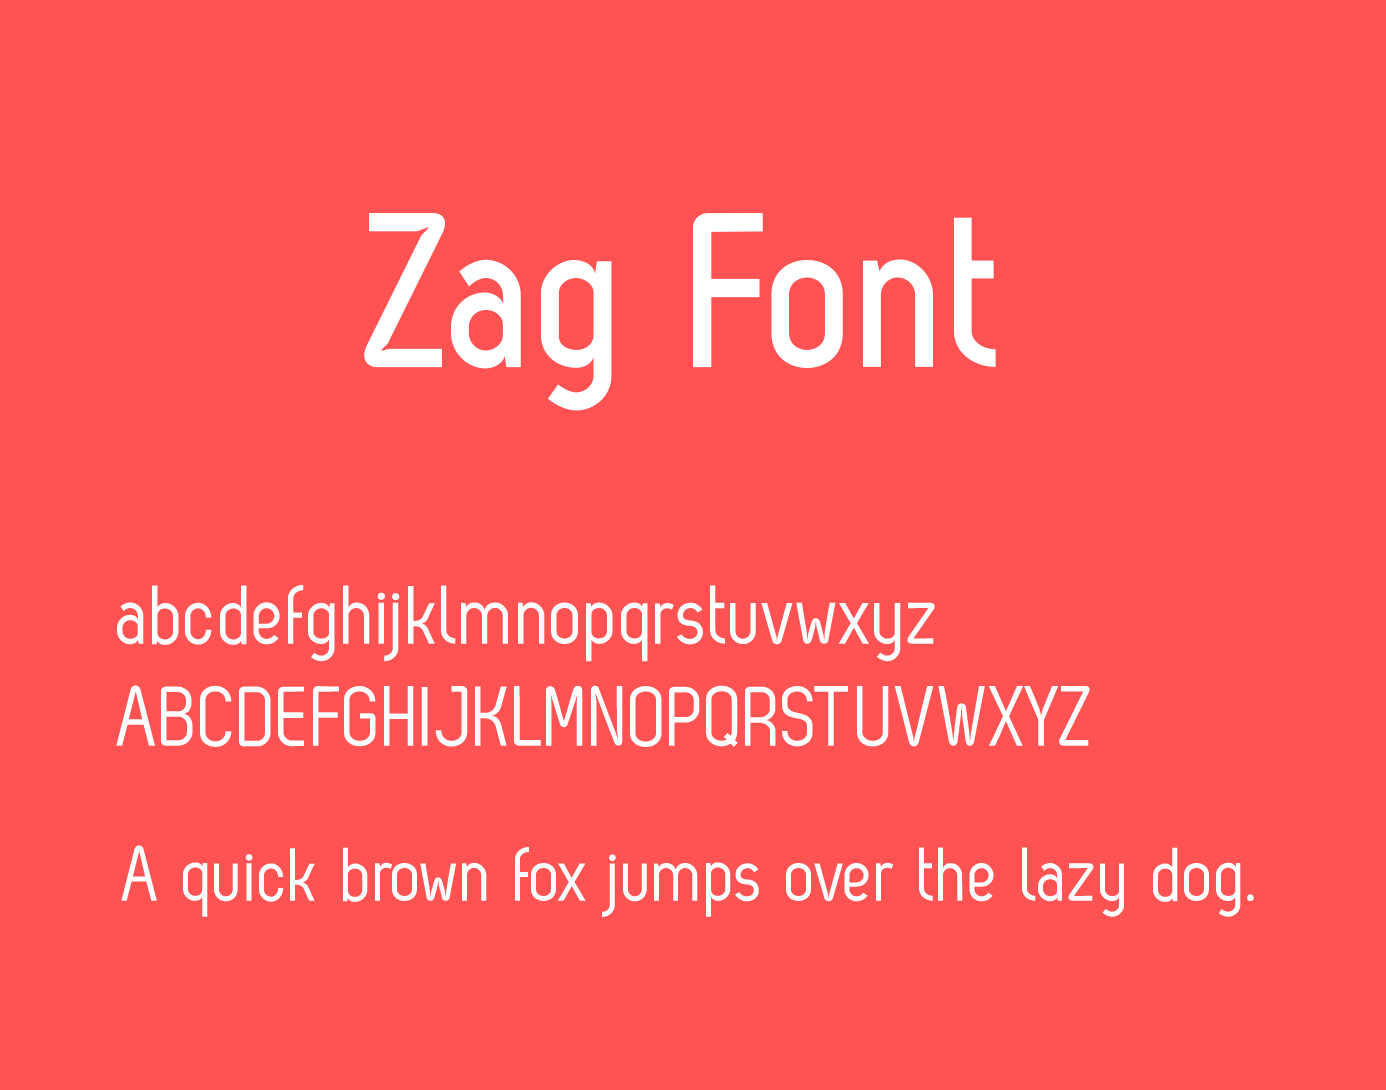 https://fontclarity.com/wp-content/uploads/2019/09/zag-font-download-0.png Free Download